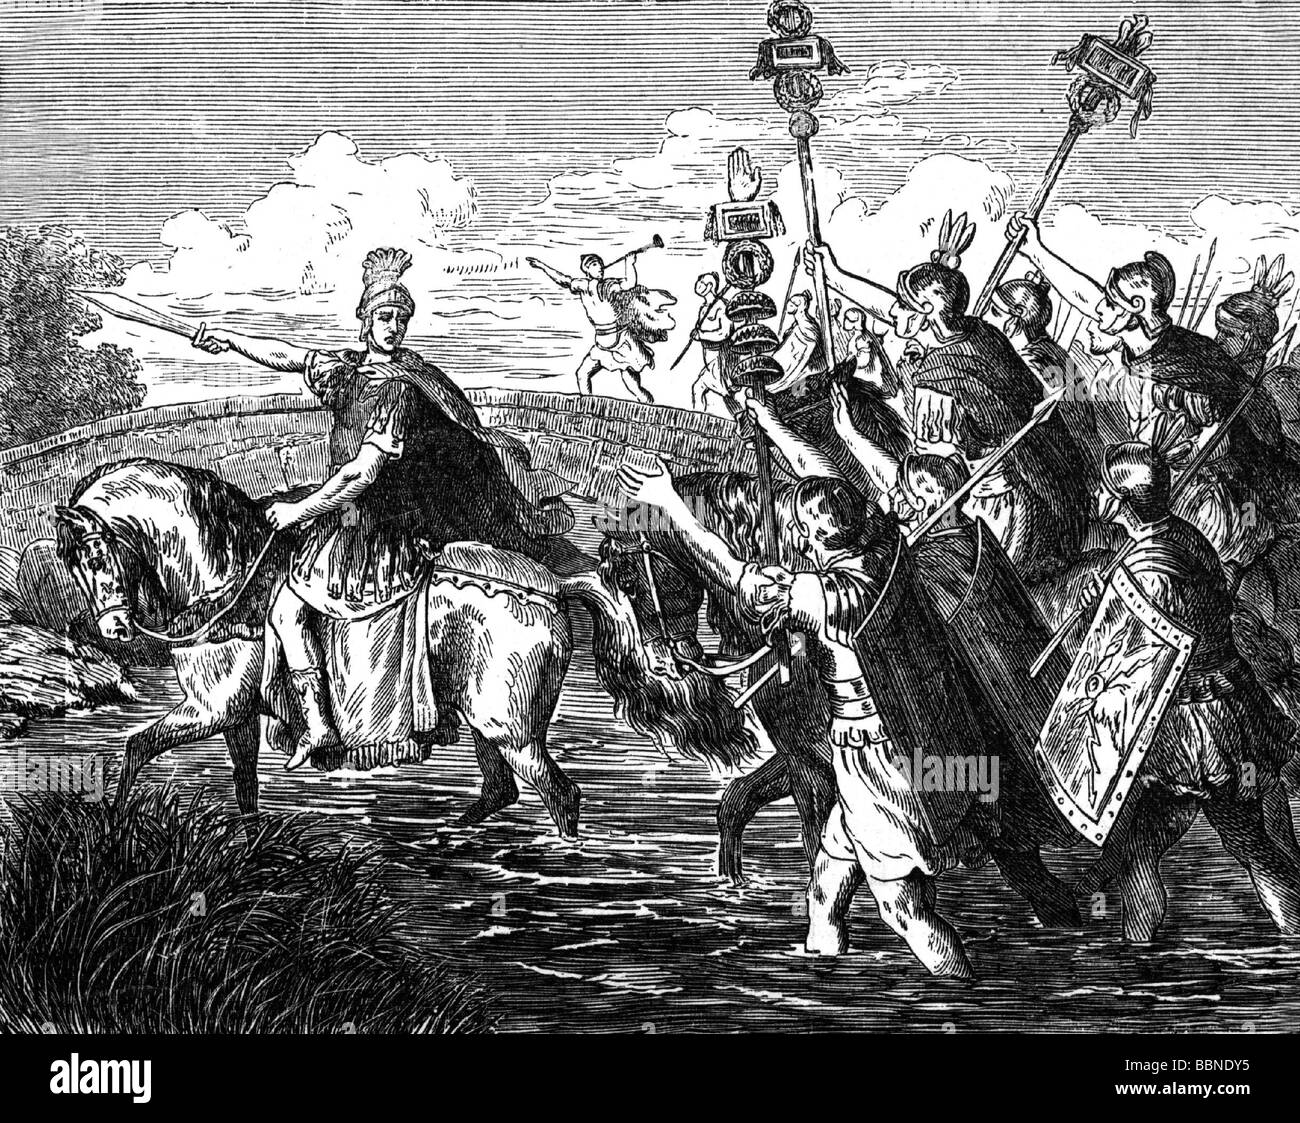 Roman Civil Wars, Caesar's Civil War 49 - 45 BC, Caius Julius Caesar crossing the Rubicon with his troops, 11.1.49 - Stock Image